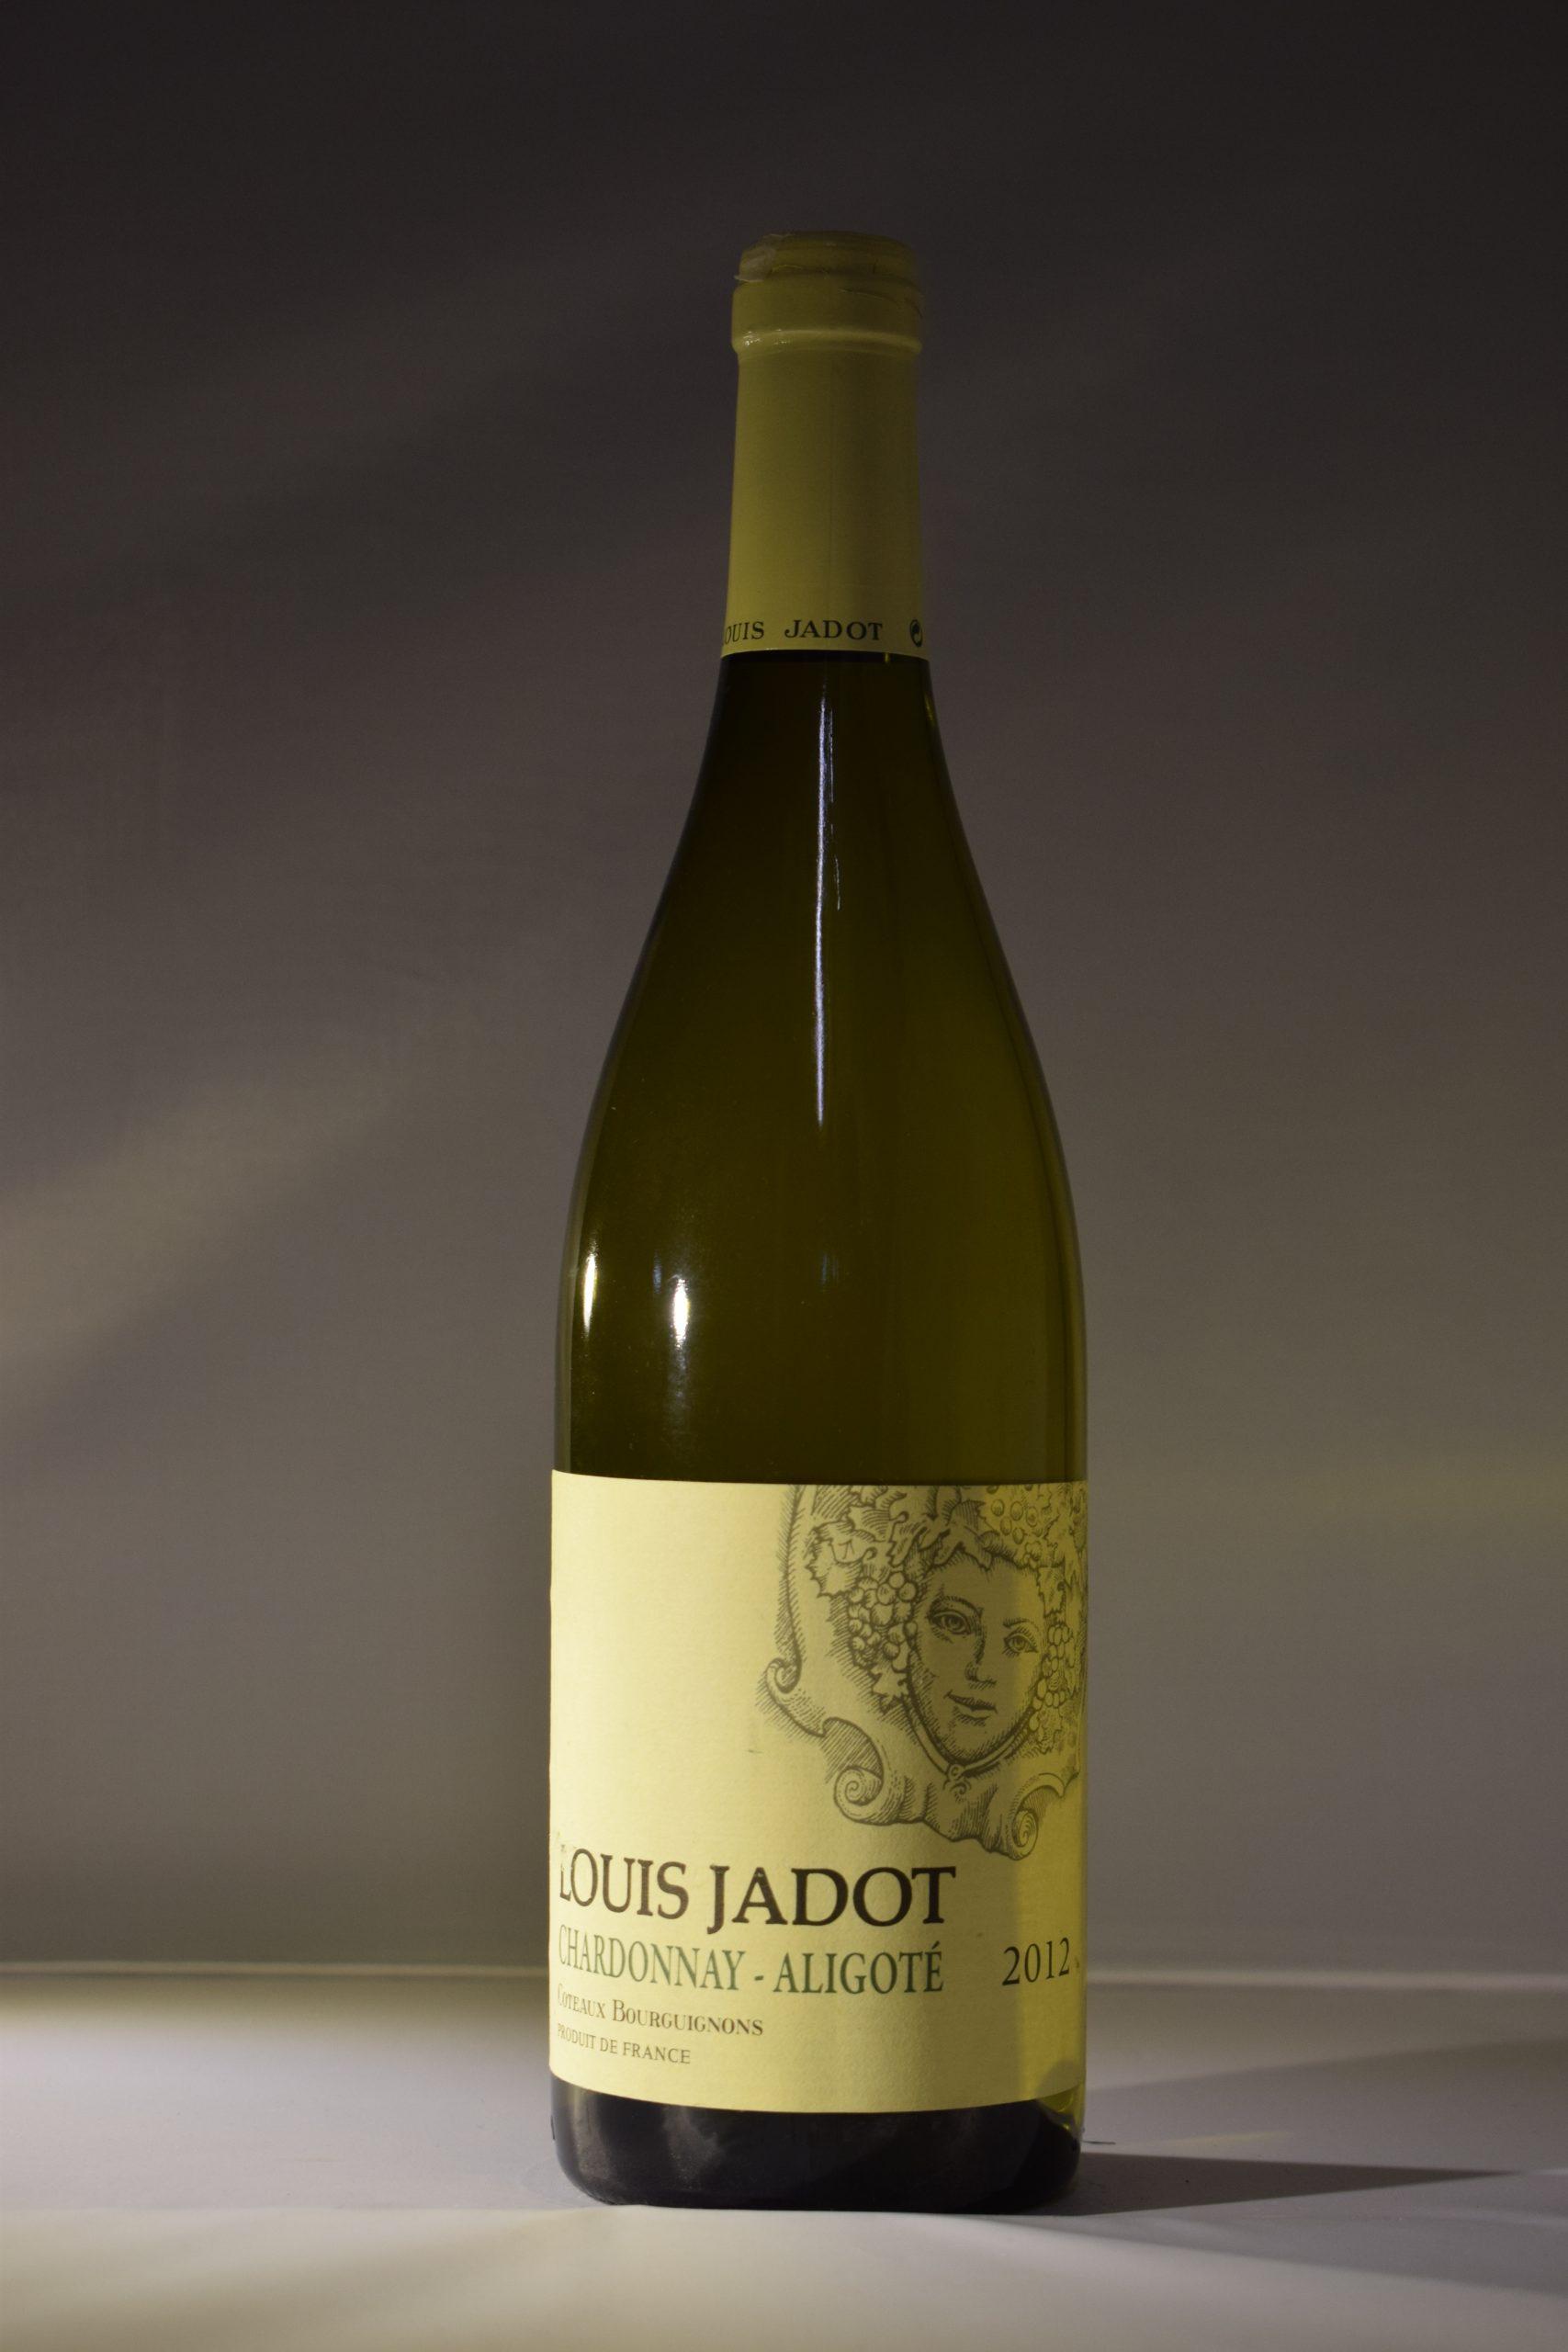 Louis Jadot Chardonnay-aligote 2012 front